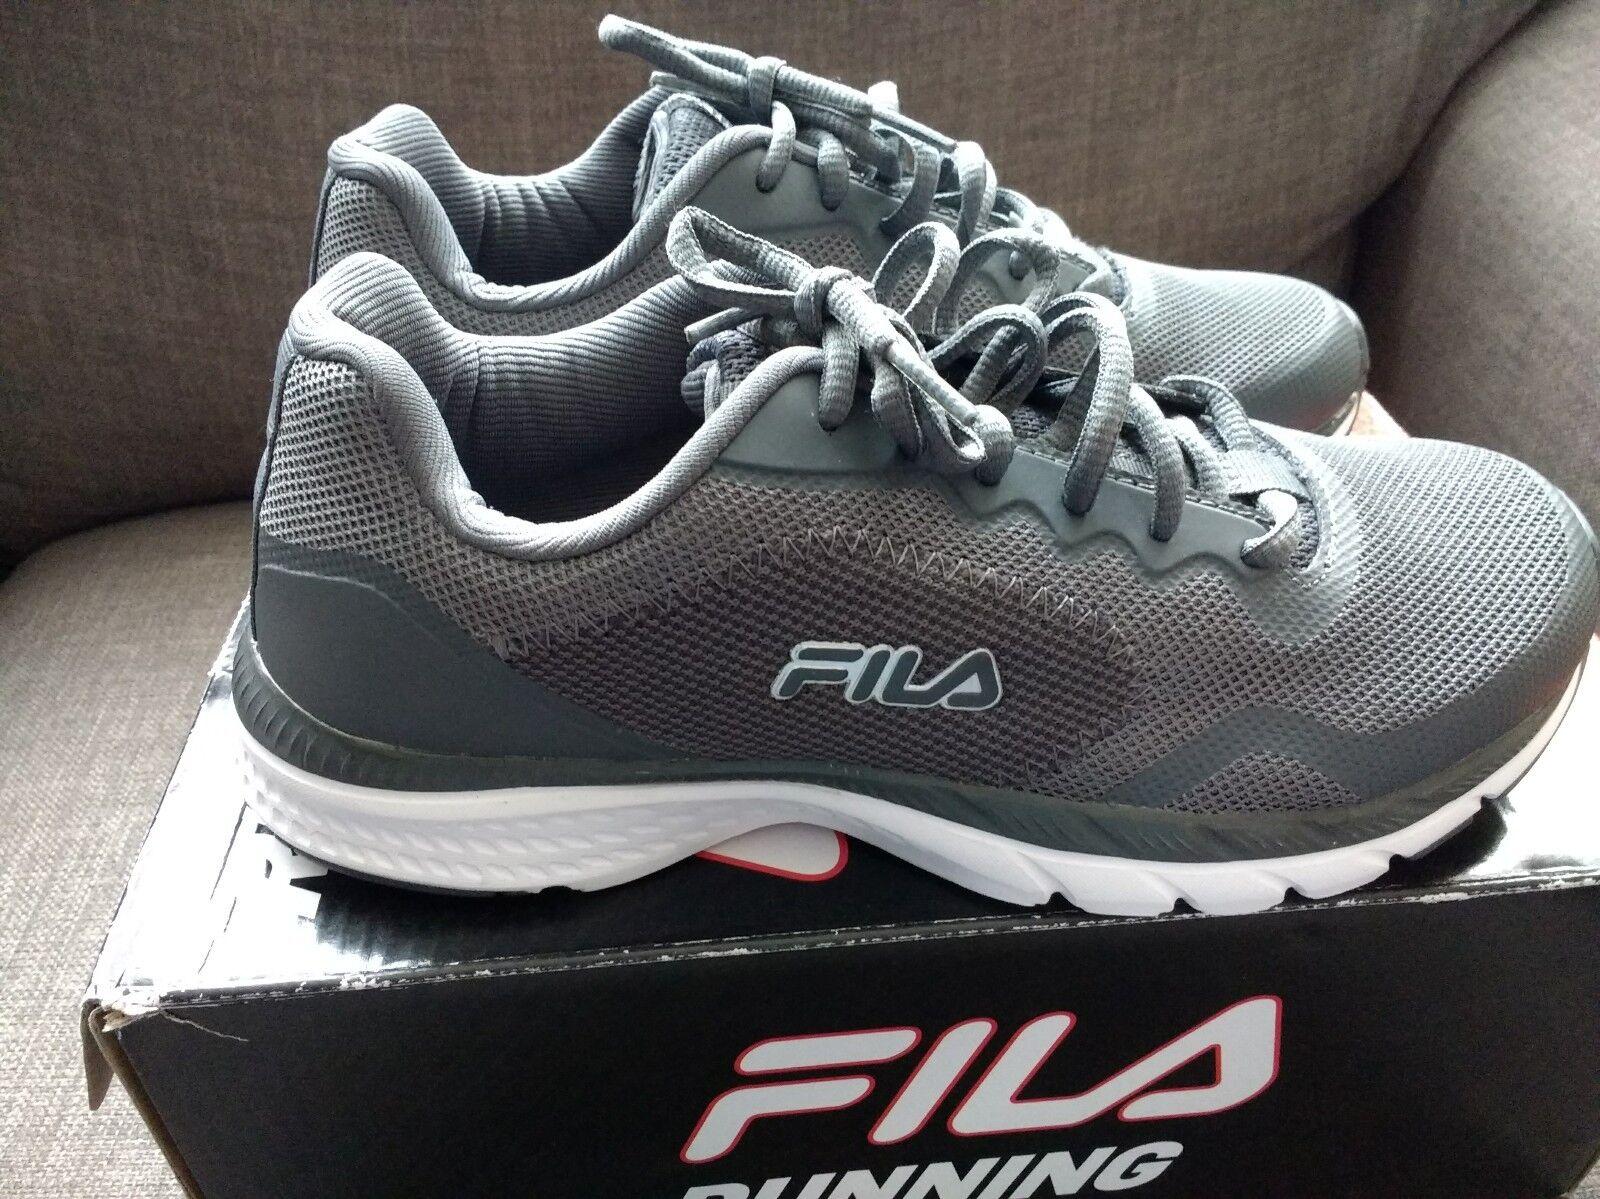 FILA GREY TRAINERS SIZE 6 NEW IN BOX